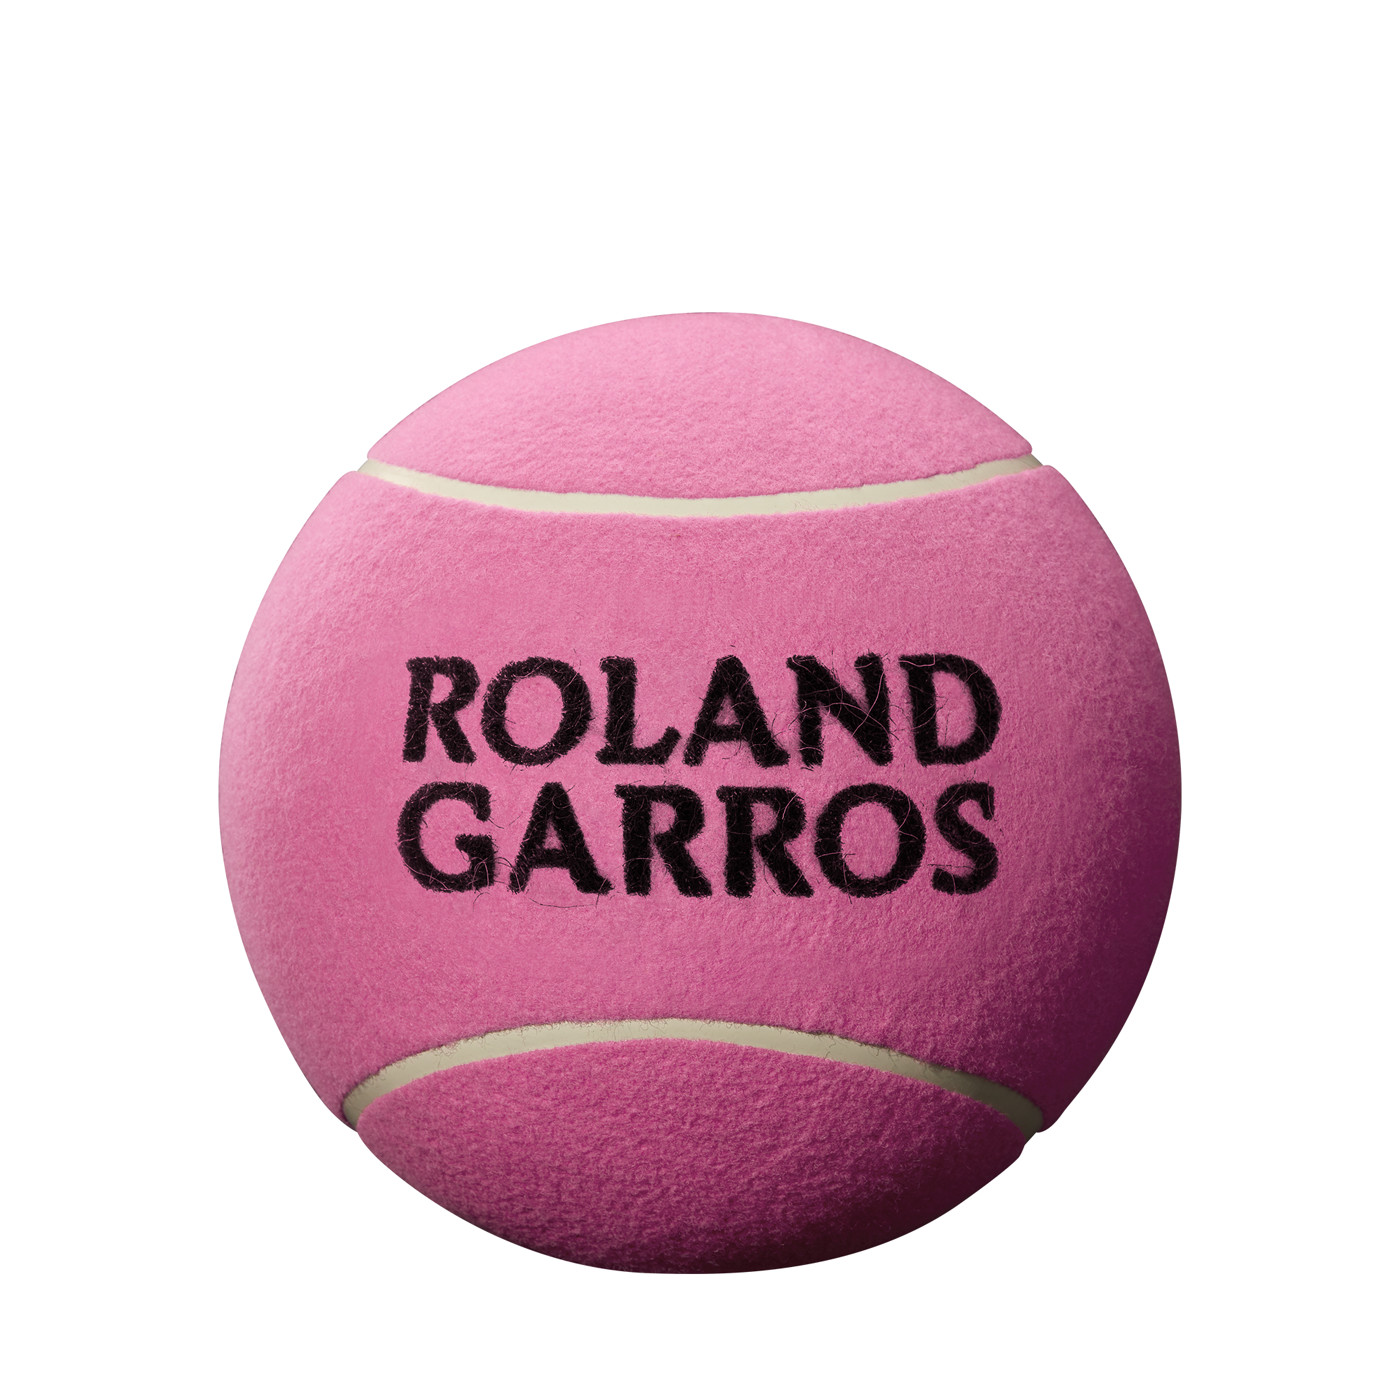 WILSON ROLAND GARROS 9 JUMBO TBALL PK DEFL